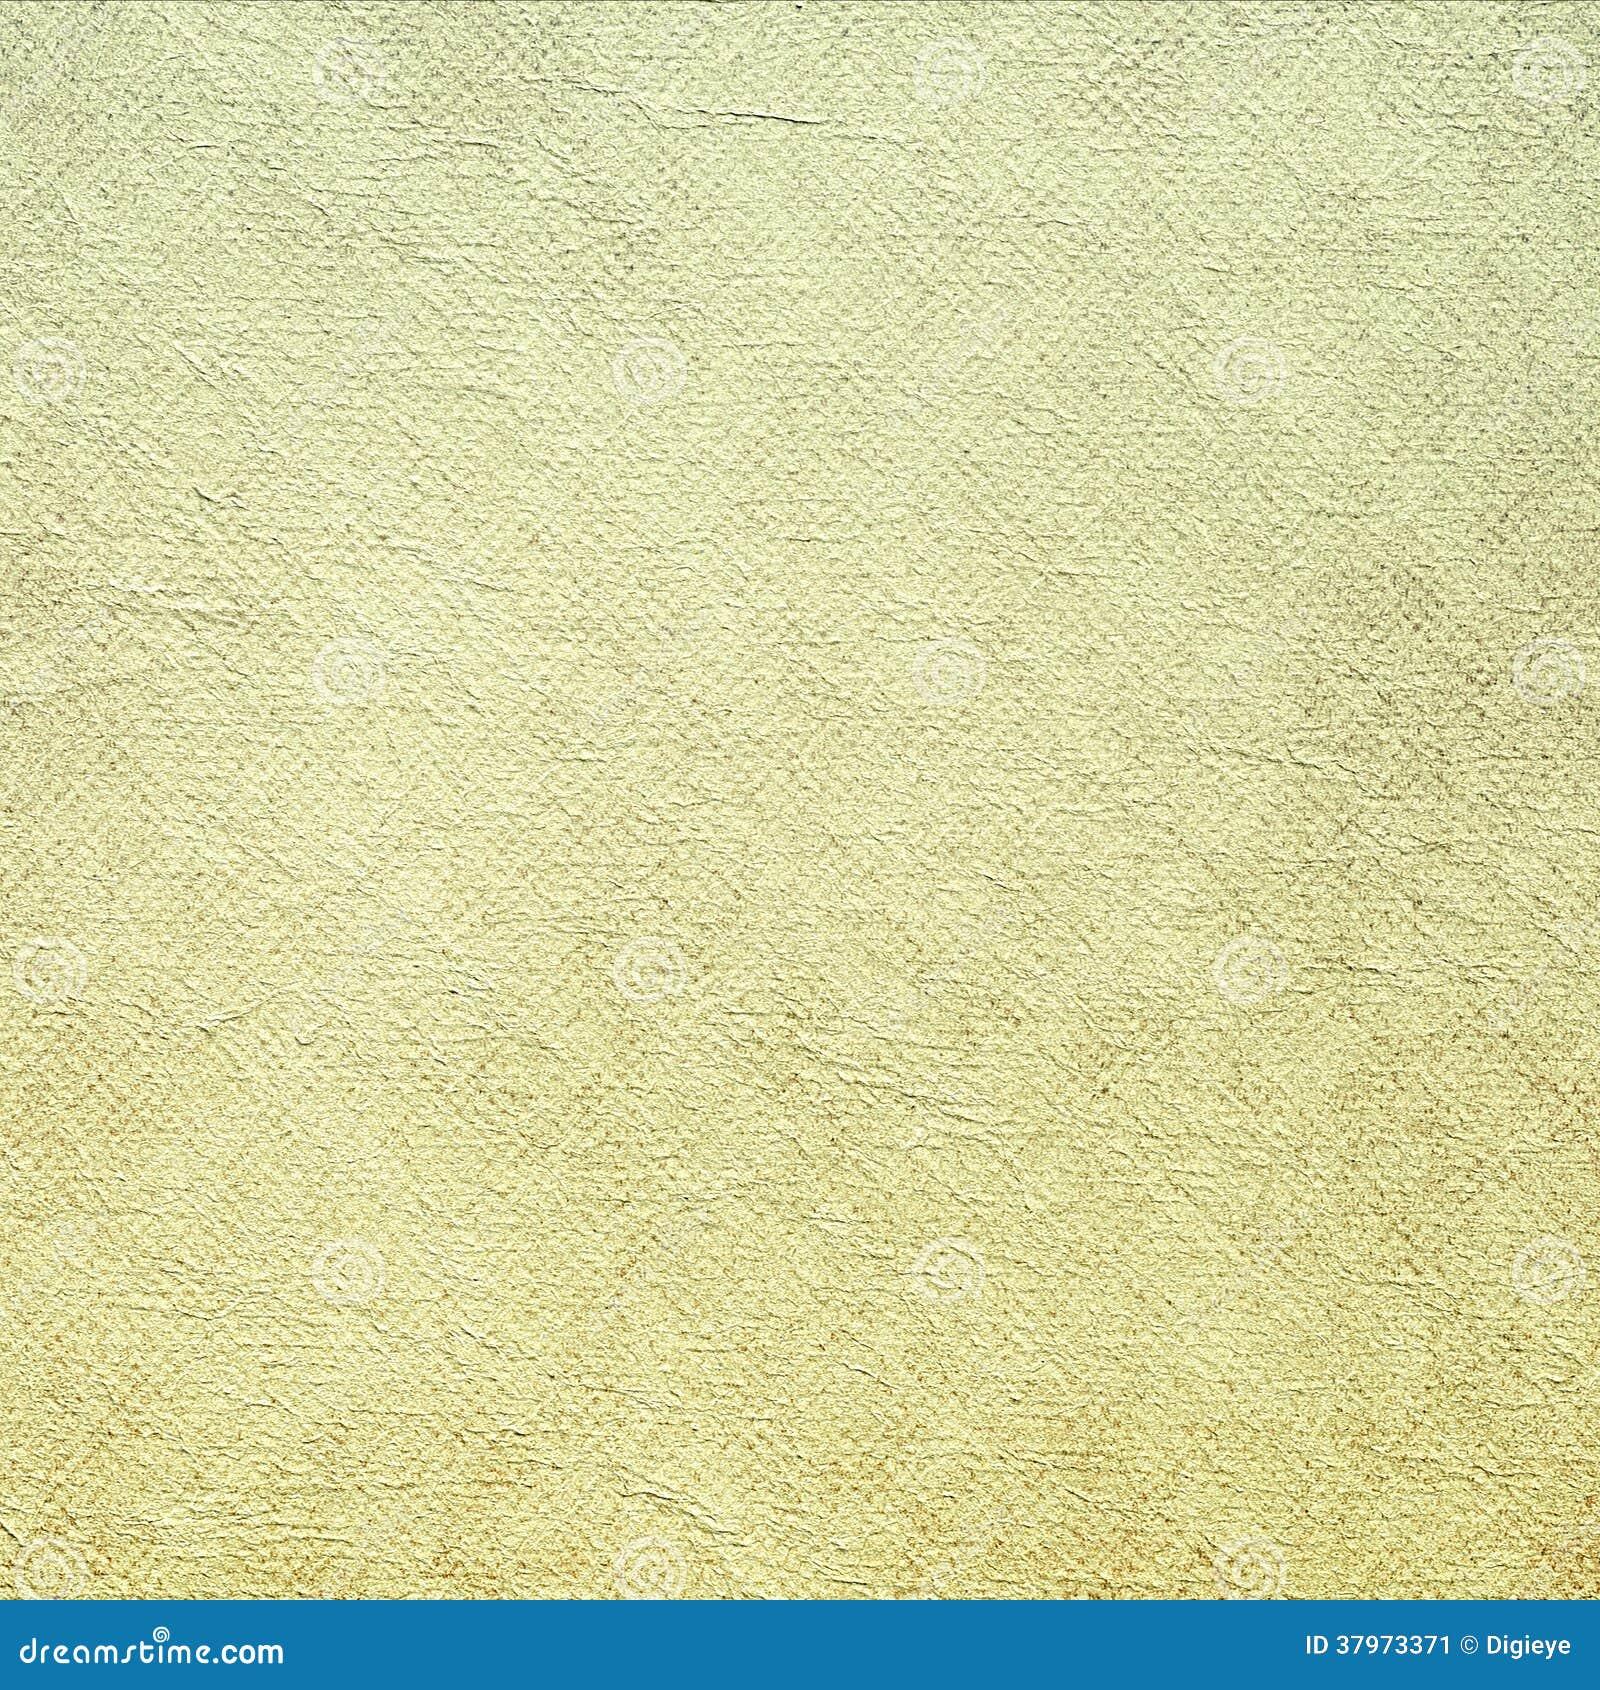 Crumpled handmade paper background